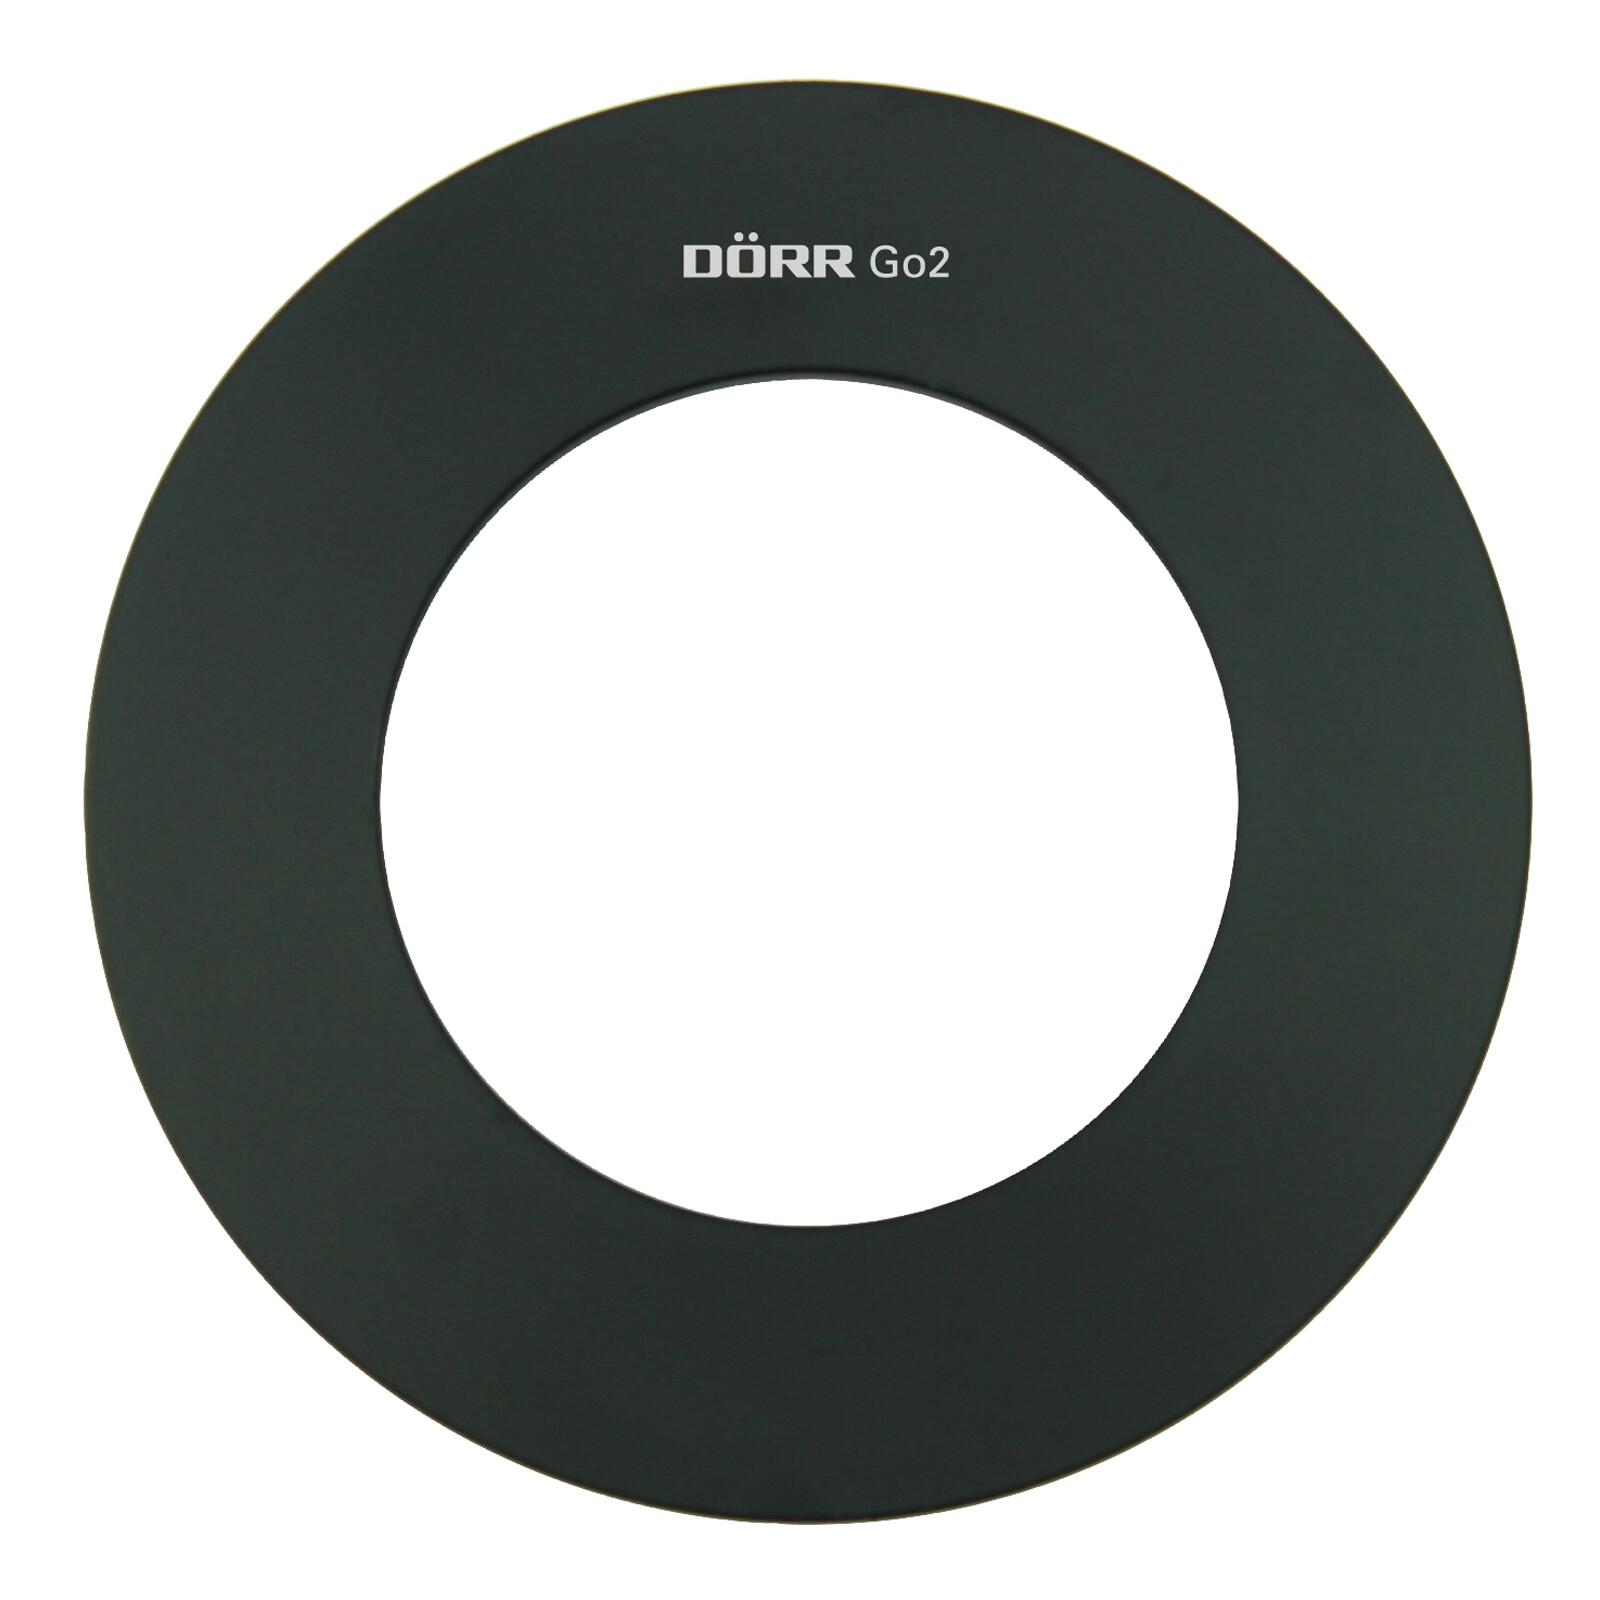 Dörr Go2 Metall Anschlussring 46mm